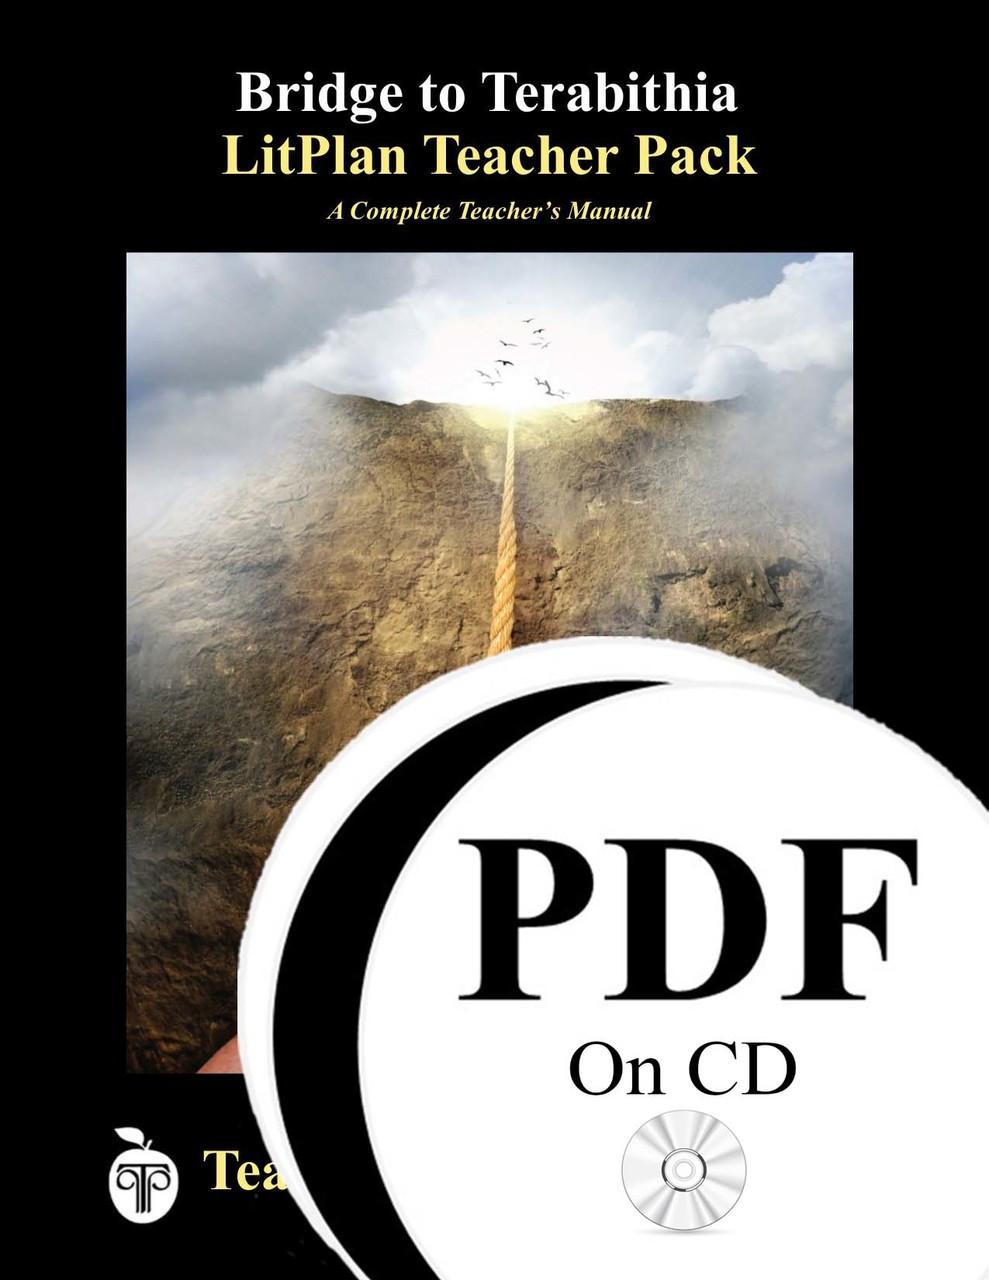 Bridge to Terabithia Lesson Plans | LitPlan Teacher Pack (teacher